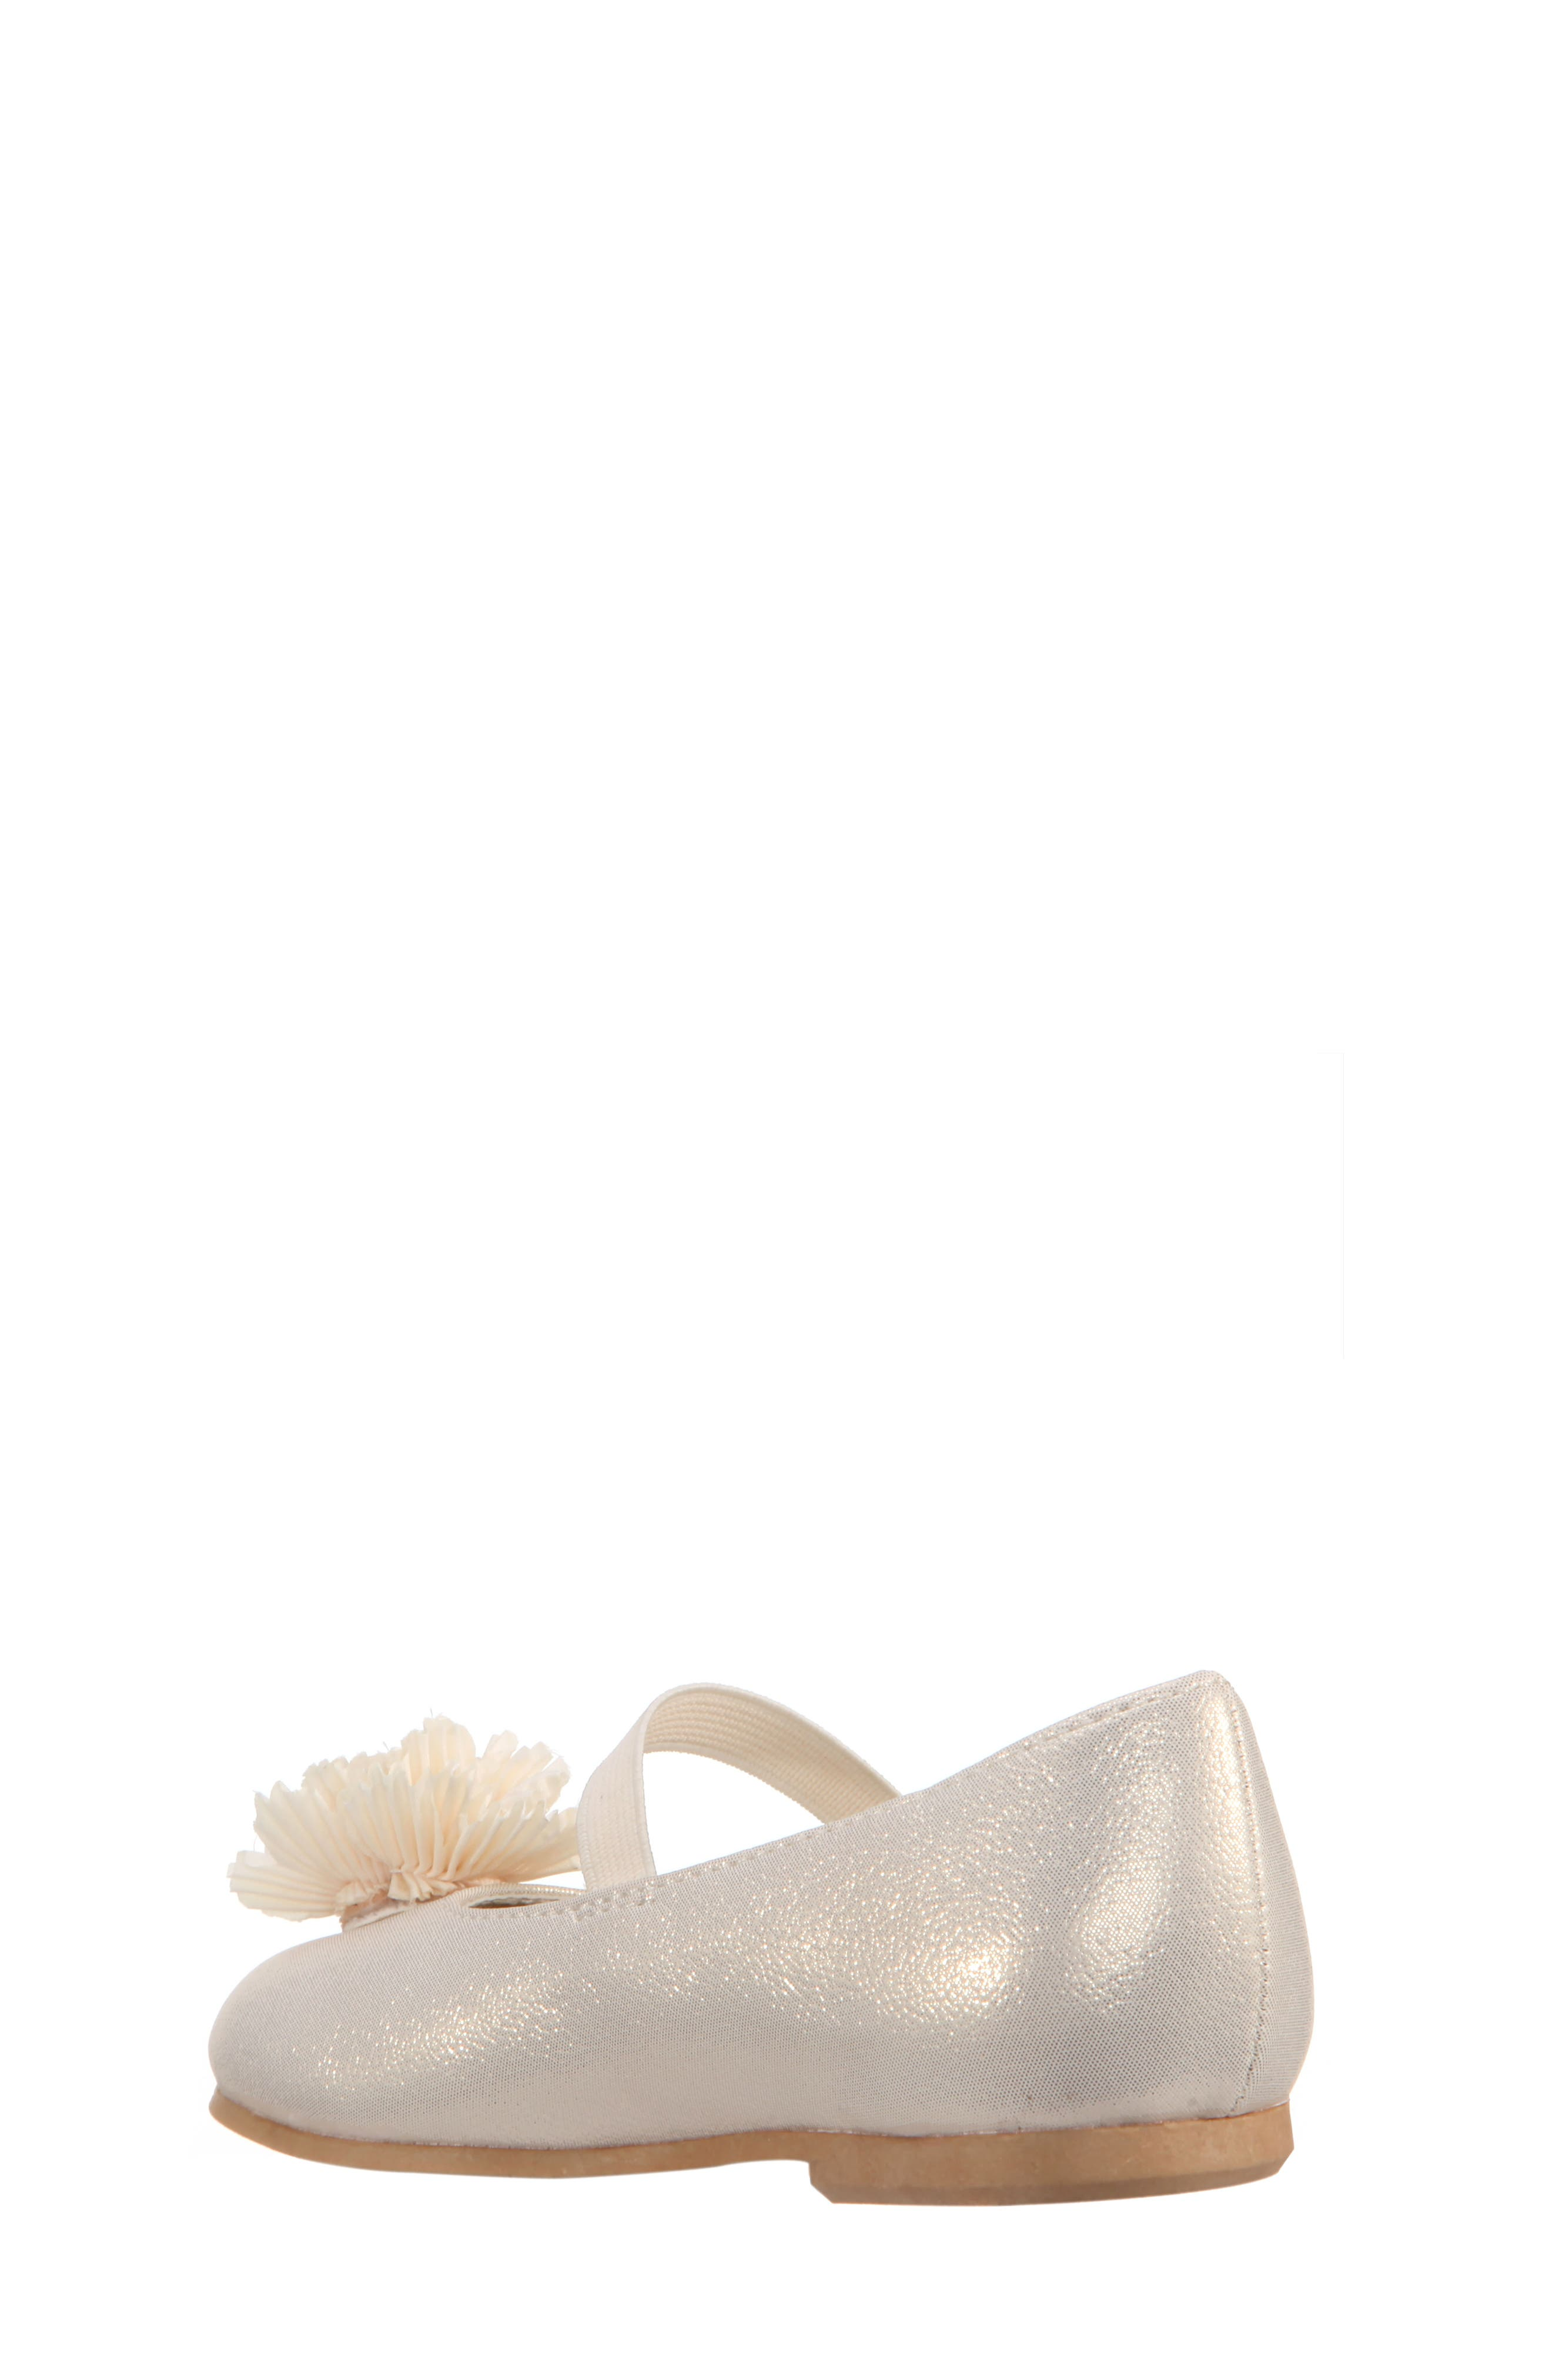 Jemma-T Bow Ballet Flat,                             Alternate thumbnail 2, color,                             Platino Metallic